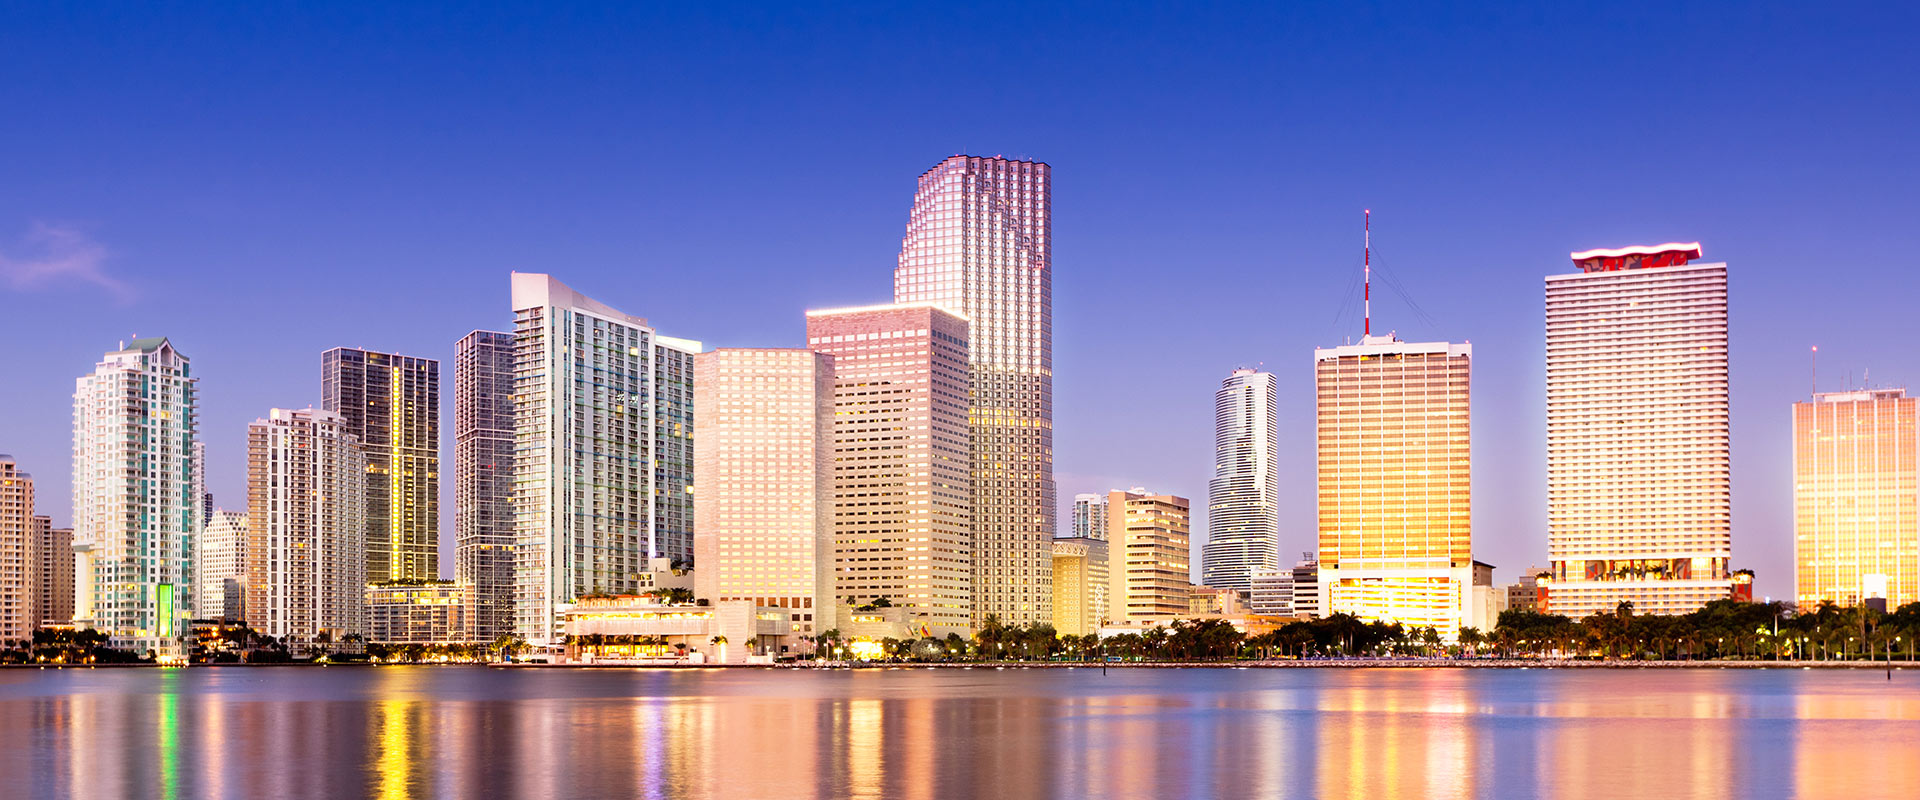 Bild Miami